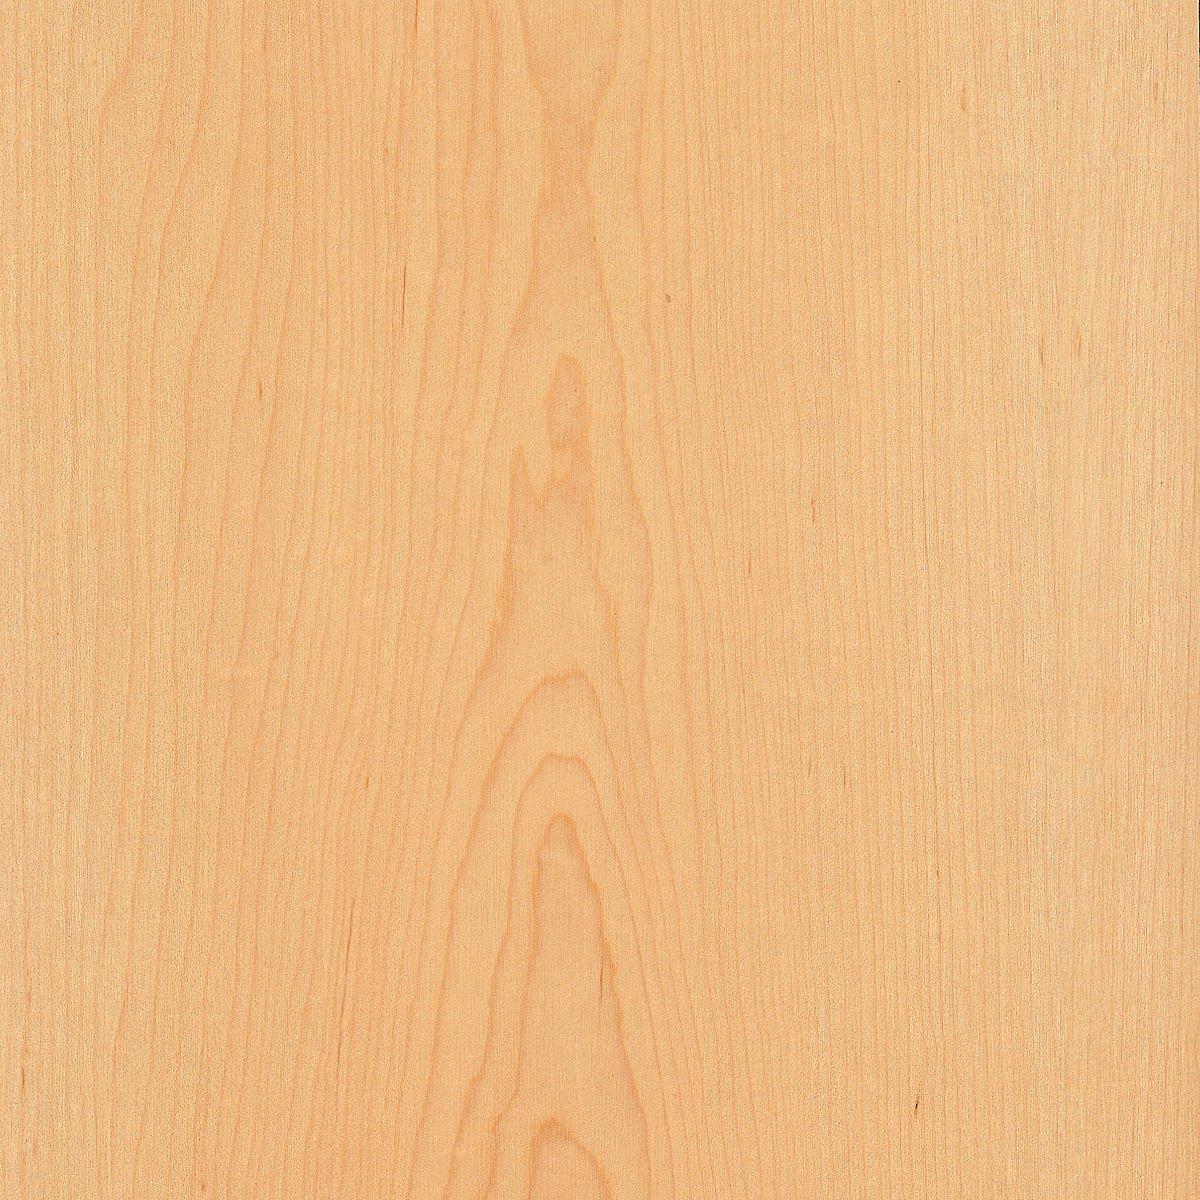 Maple Wood Lumber